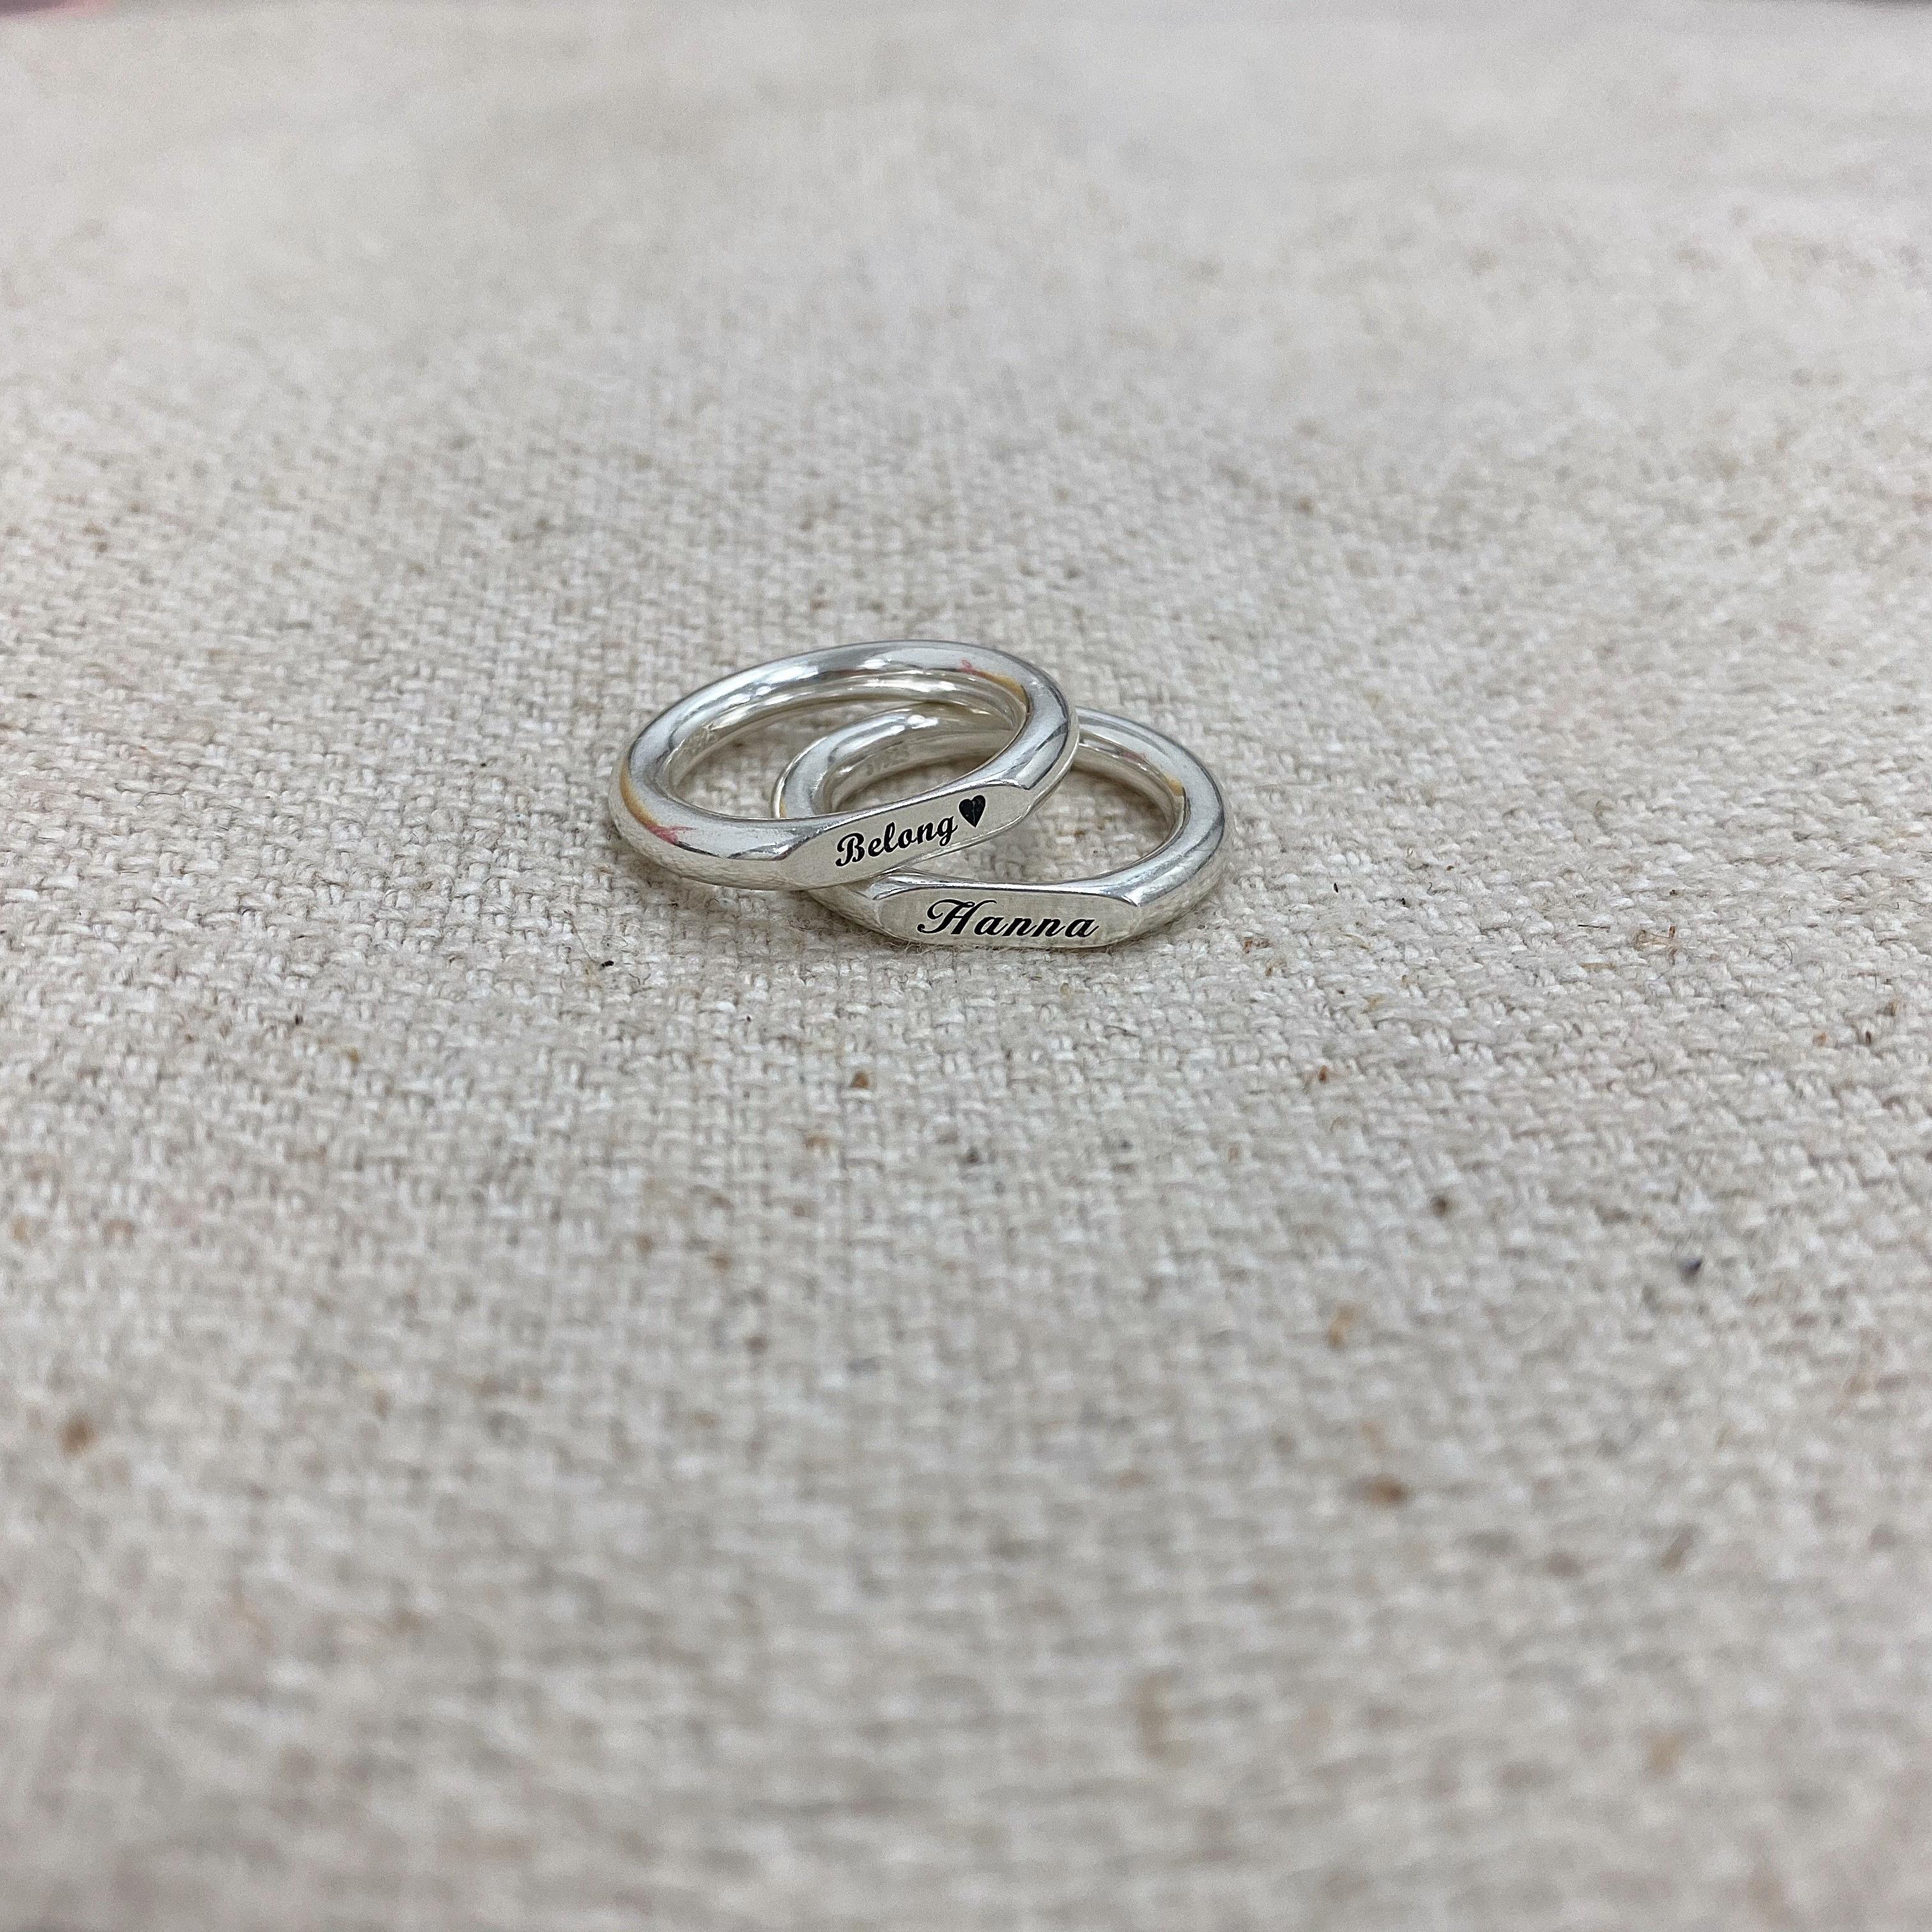 Futuro正韓・925 全純銀客製化平戒指